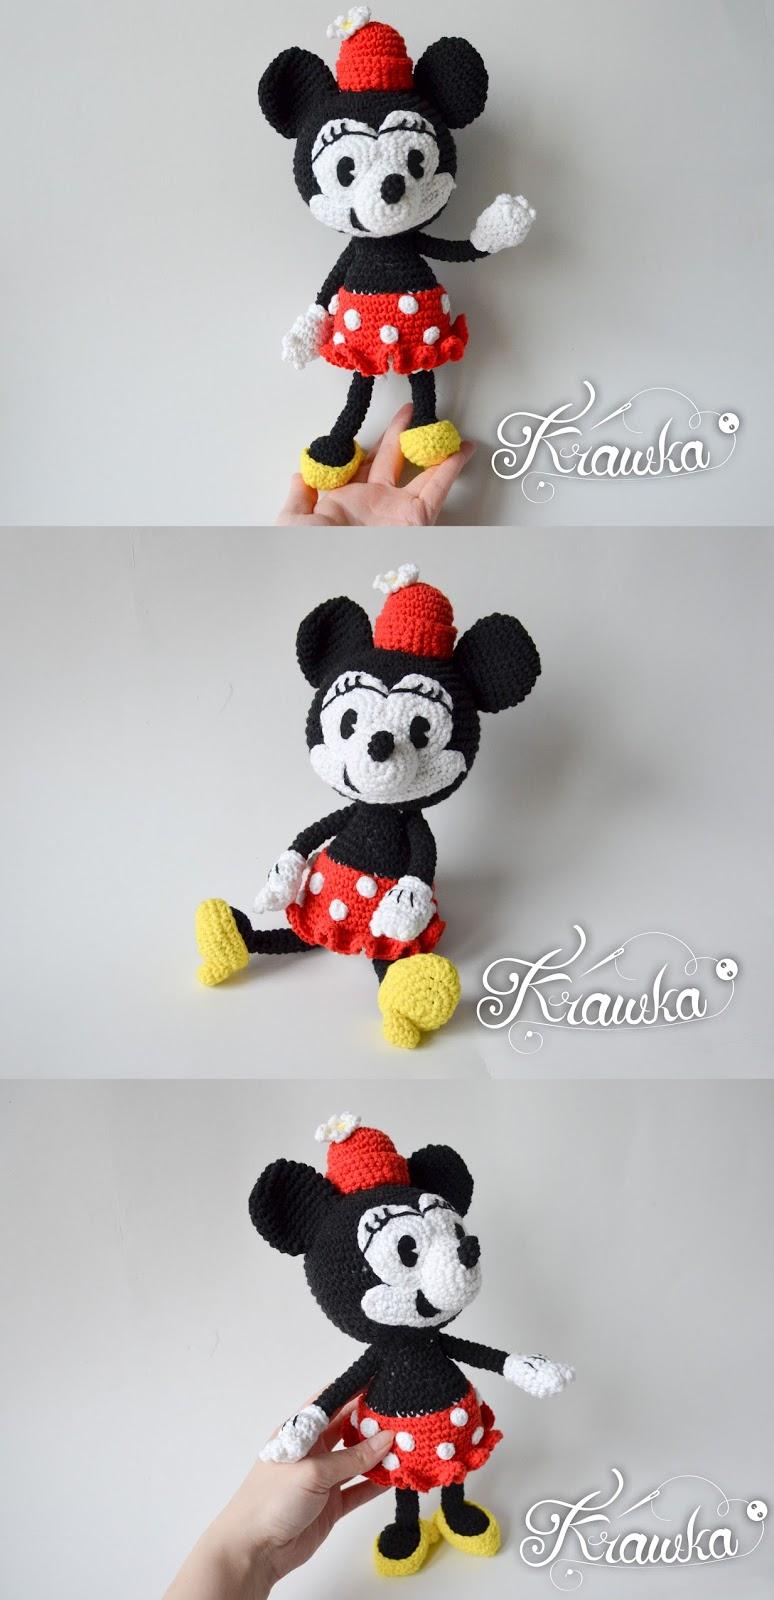 Krawka: Vintage Minnie